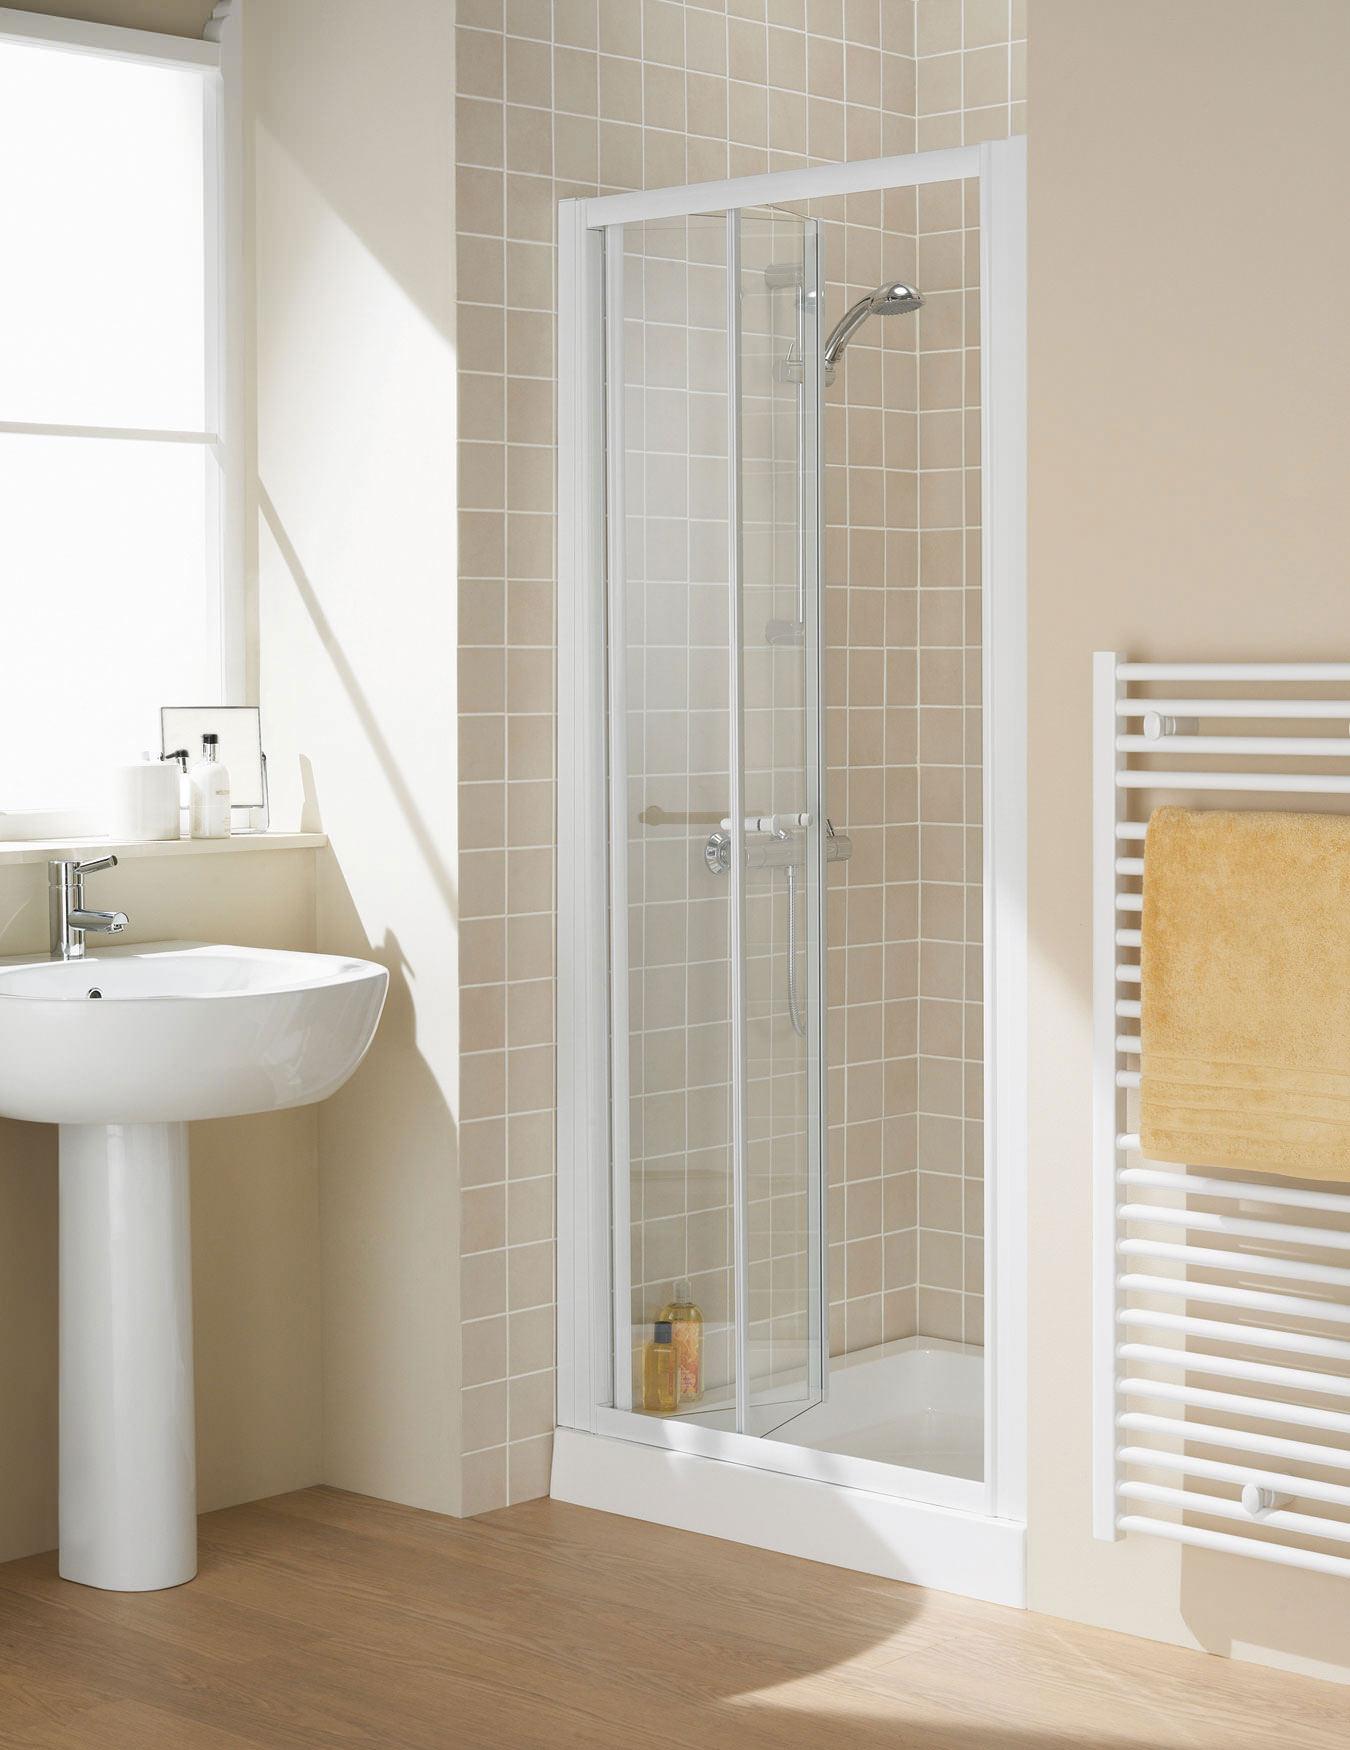 Lakes classic silver semi frame less bi fold door 1000 x for 1000 bi fold shower door